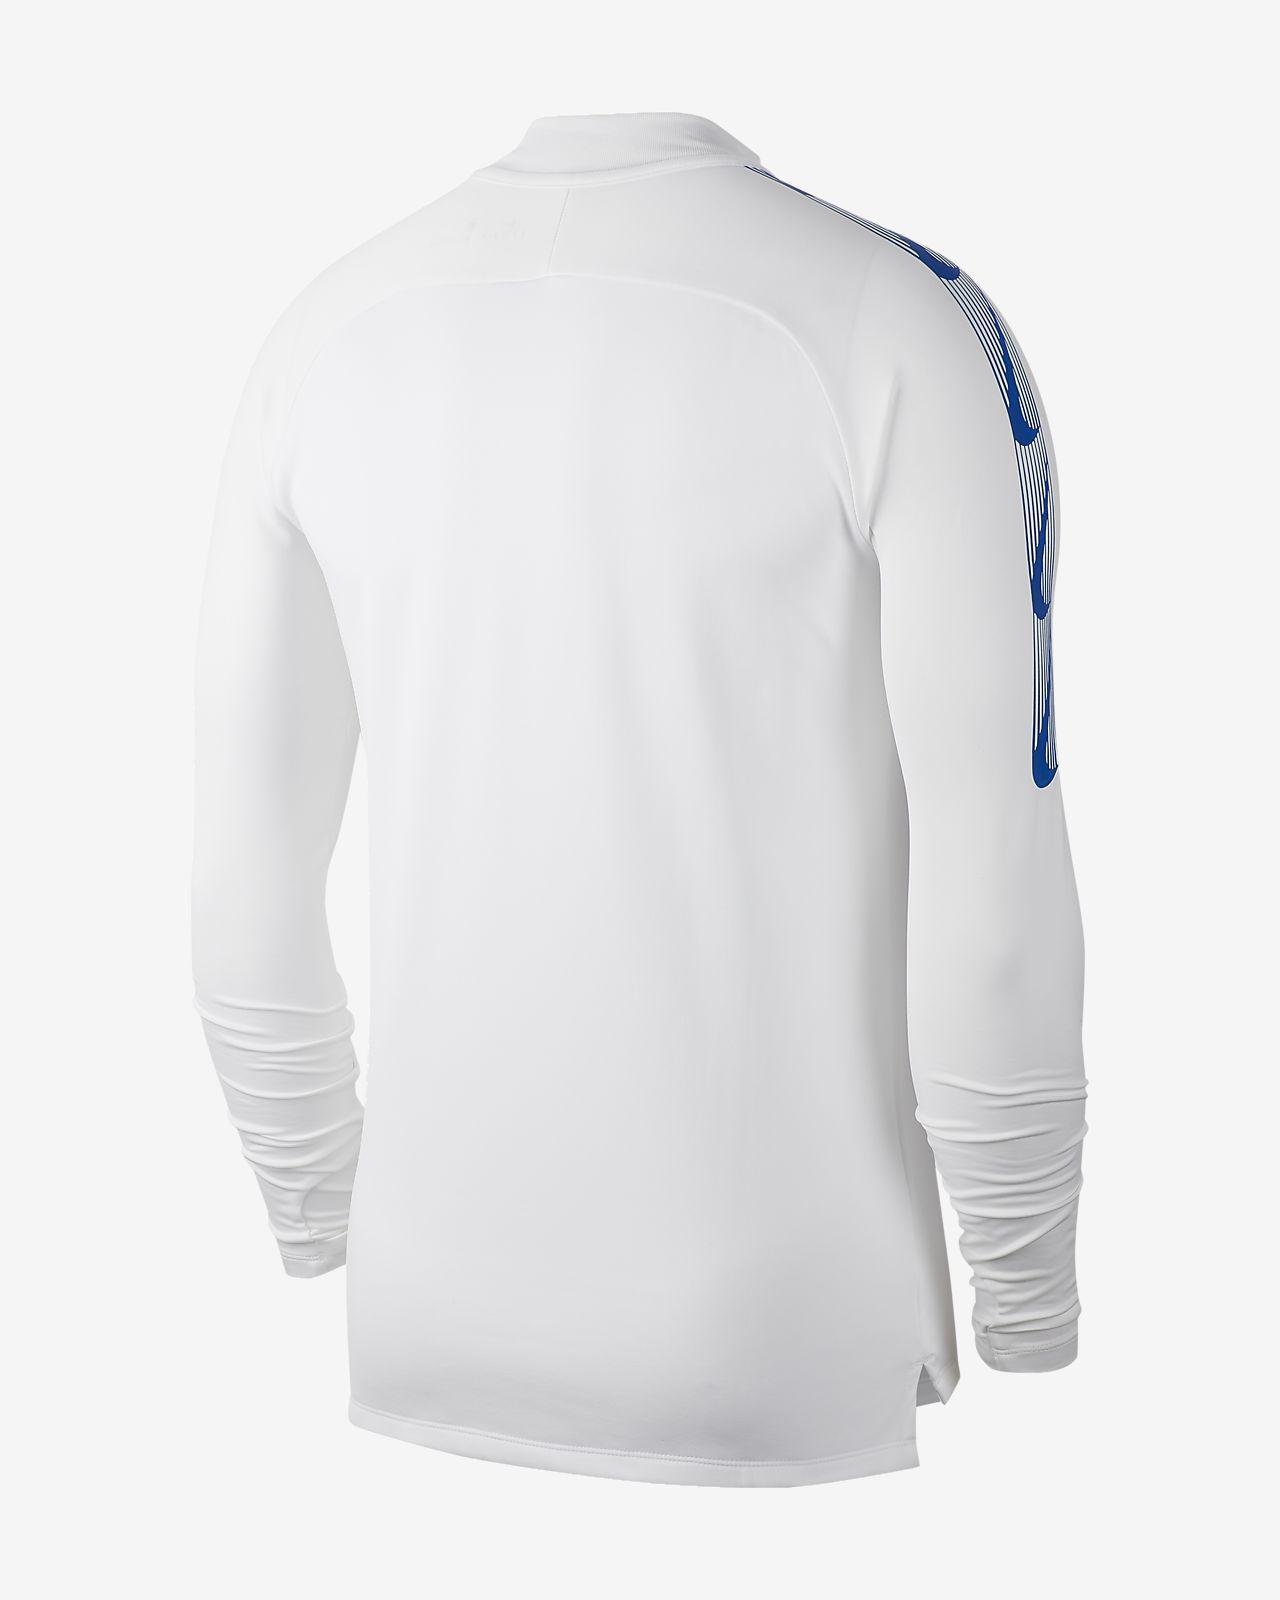 ccd7fdf6e Chelsea FC Dri-FIT Squad Drill Men s Long Sleeve Soccer Top. Nike.com